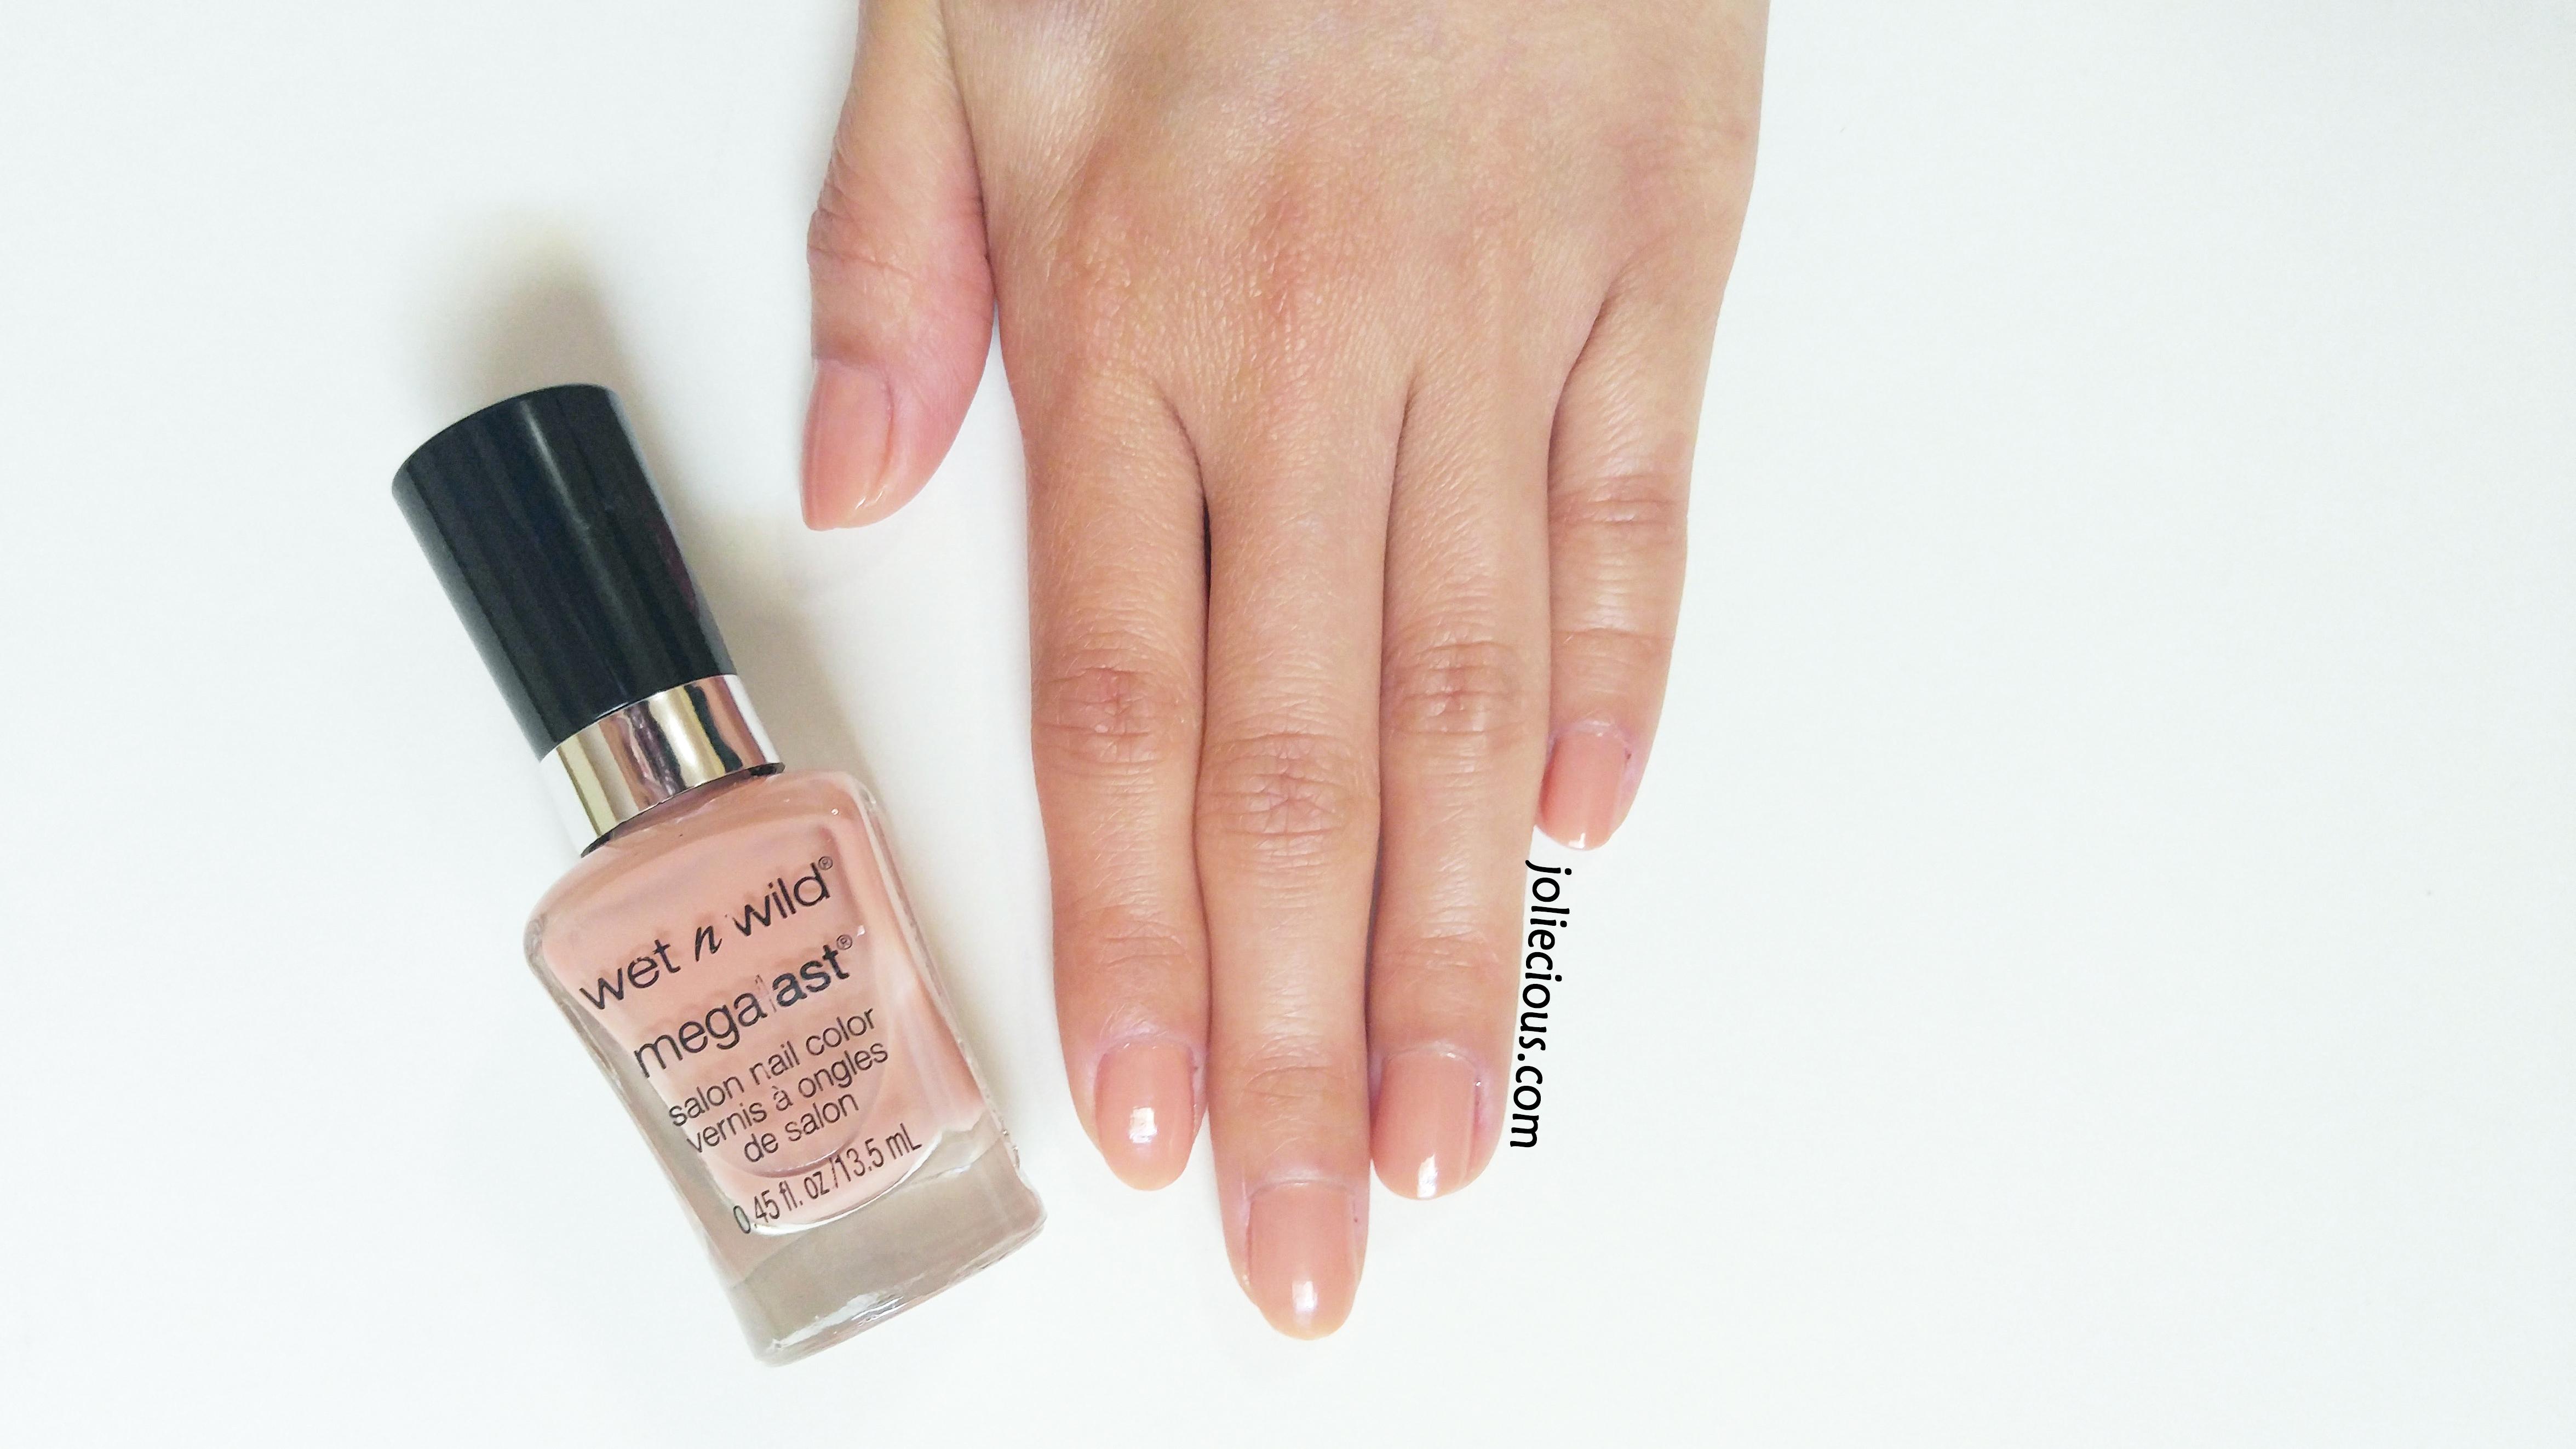 High heel nails - base color